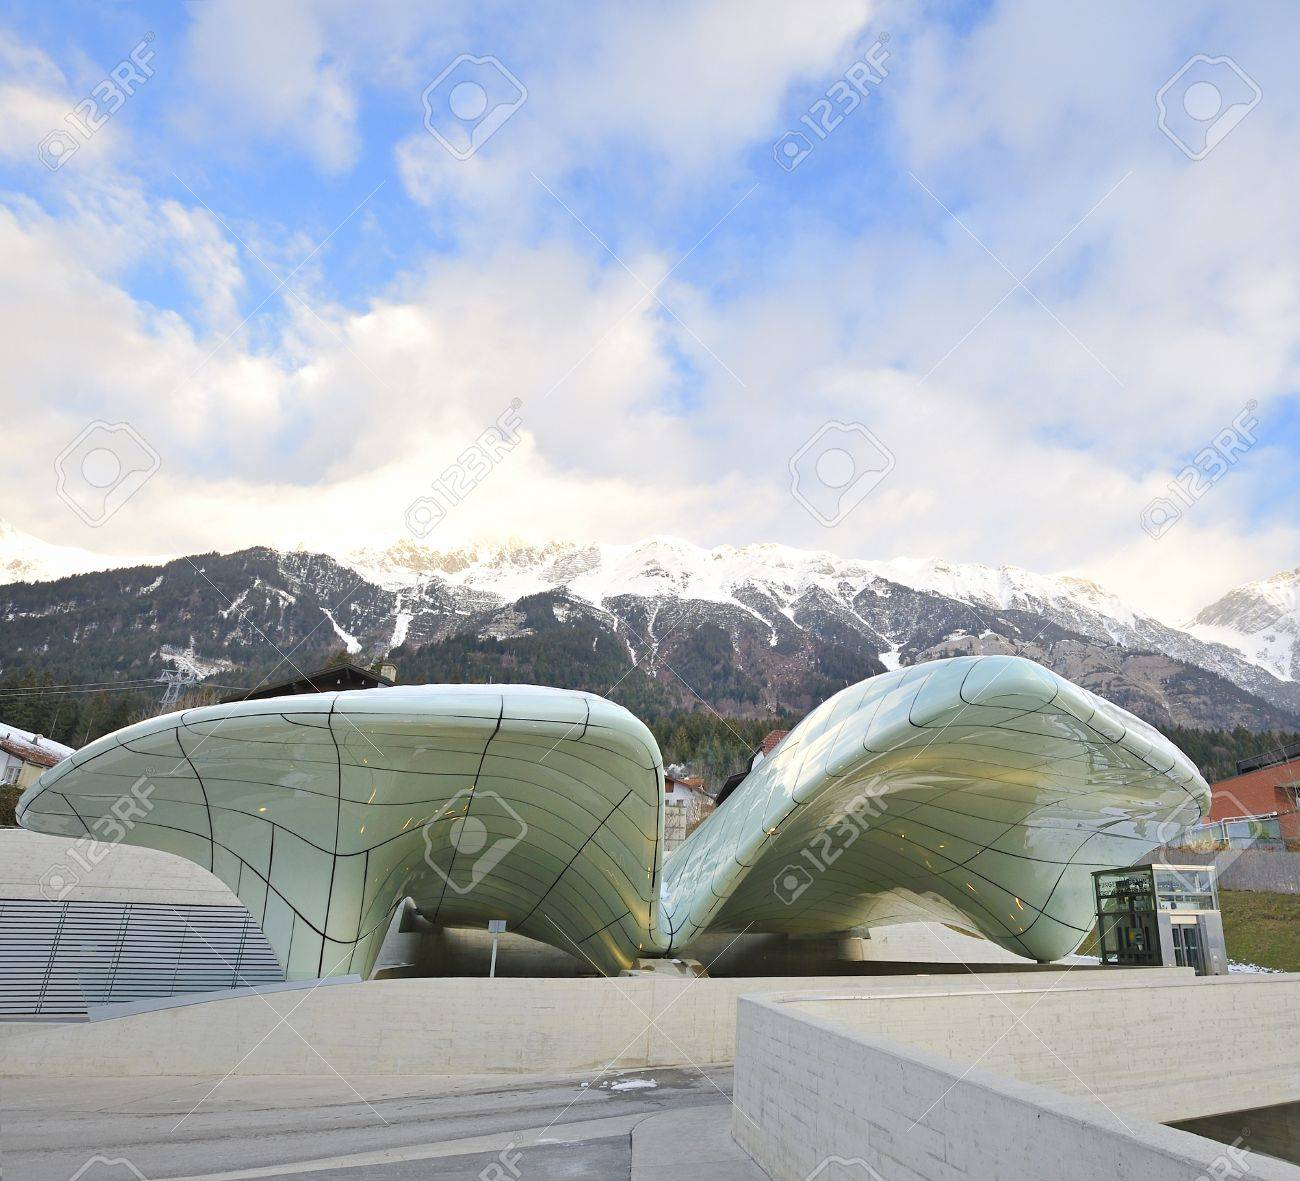 NORDKETTENBAHN INNSBBUCK AUSTRIA -JANUARY 17 Funicular in Nordkettenbahnen will now transport visitors  from the city center of Innsbruck to high mountain terrain   january17,2010 Innsbruck Austria  Stock Photo - 20765849